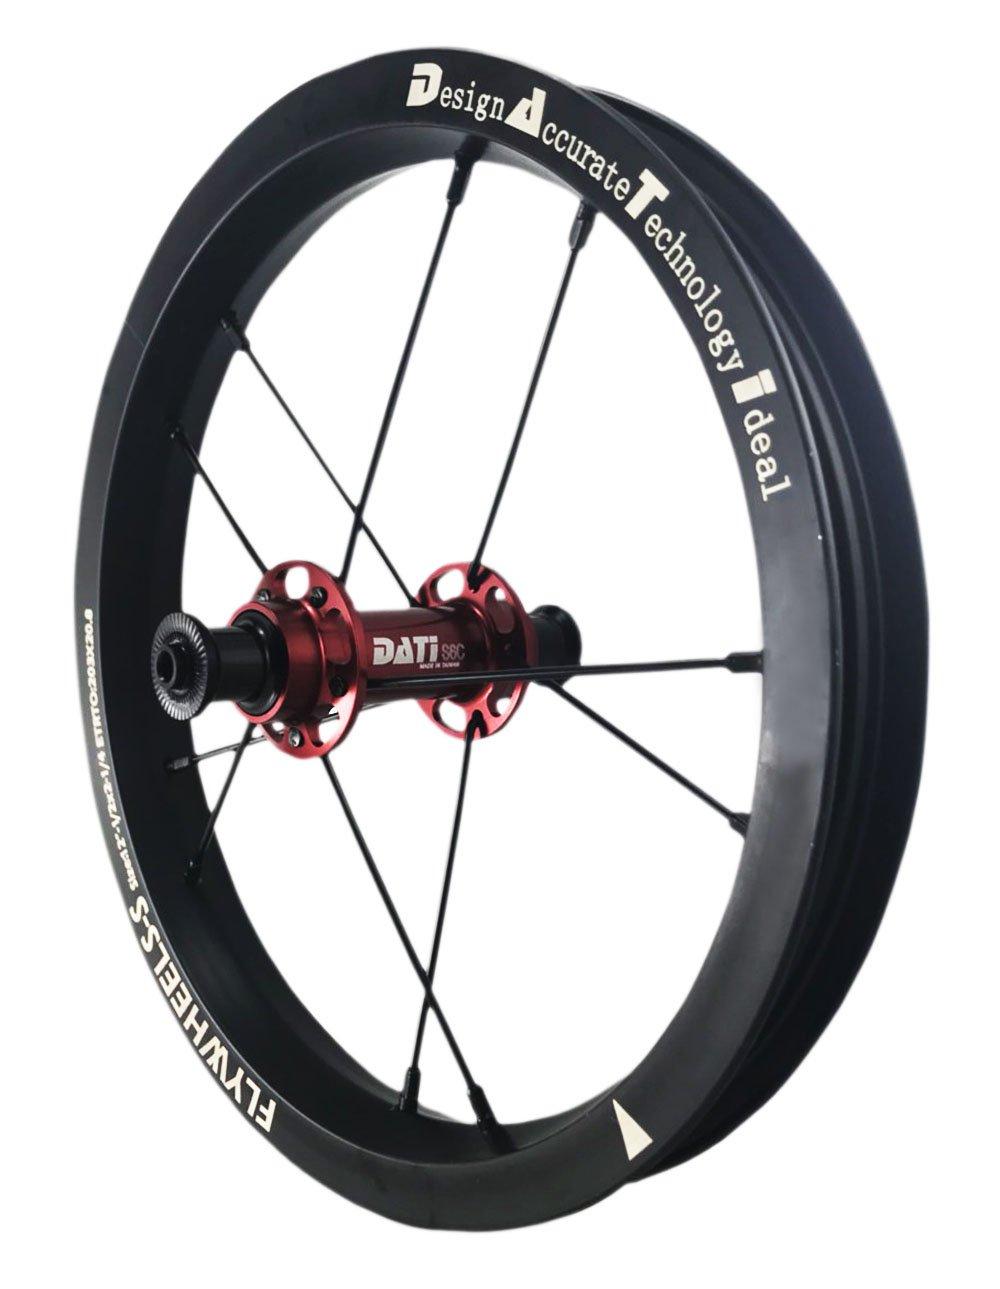 DATI 12インチ S6C-W Alloy バランスバイク Kids Balance Bike Bicycle Super light 子供自転車ホイール B07BLZ3545 95x8mm for Strider|赤 赤 95x8mm for Strider